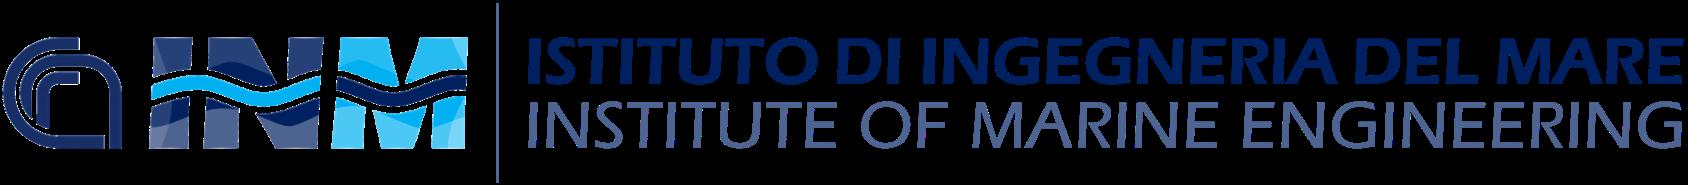 logo_CNR-INM